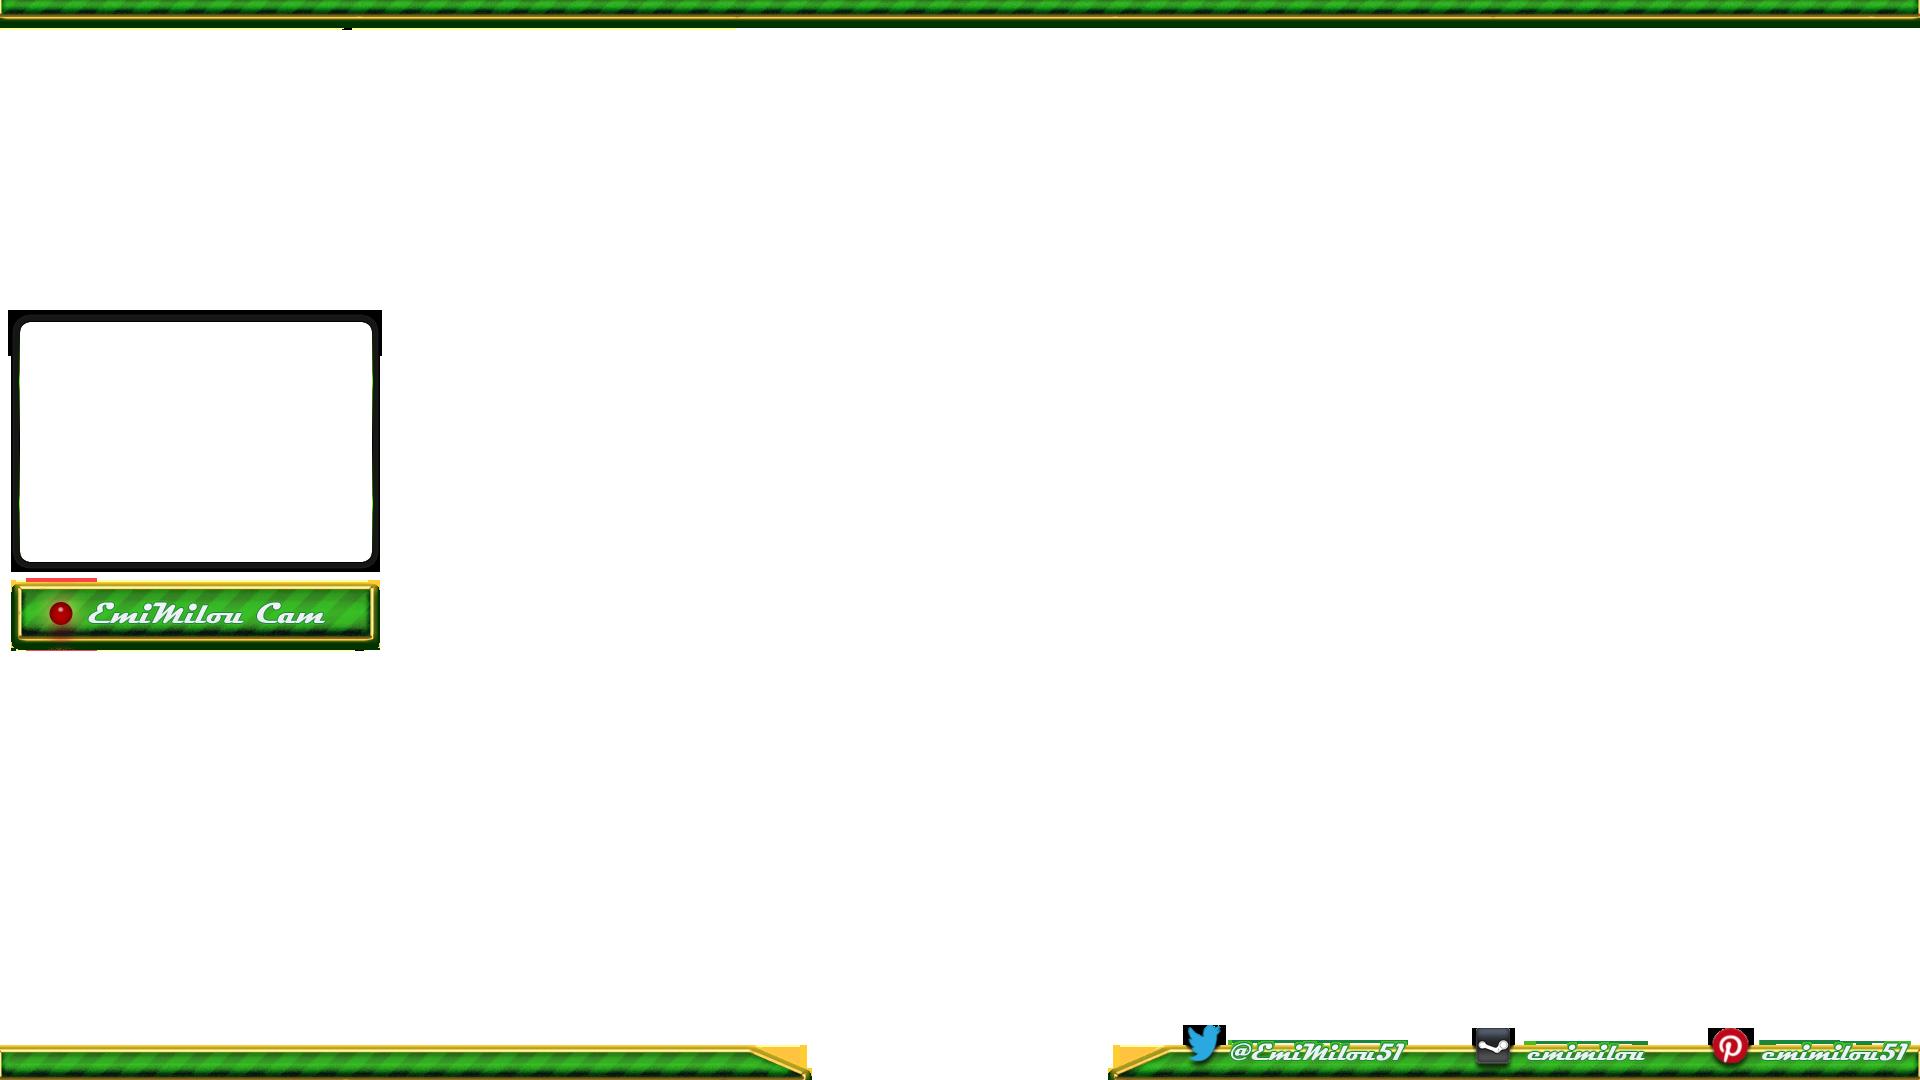 Overlay avec fond transparent pour chaîne Twitch.tv (dim